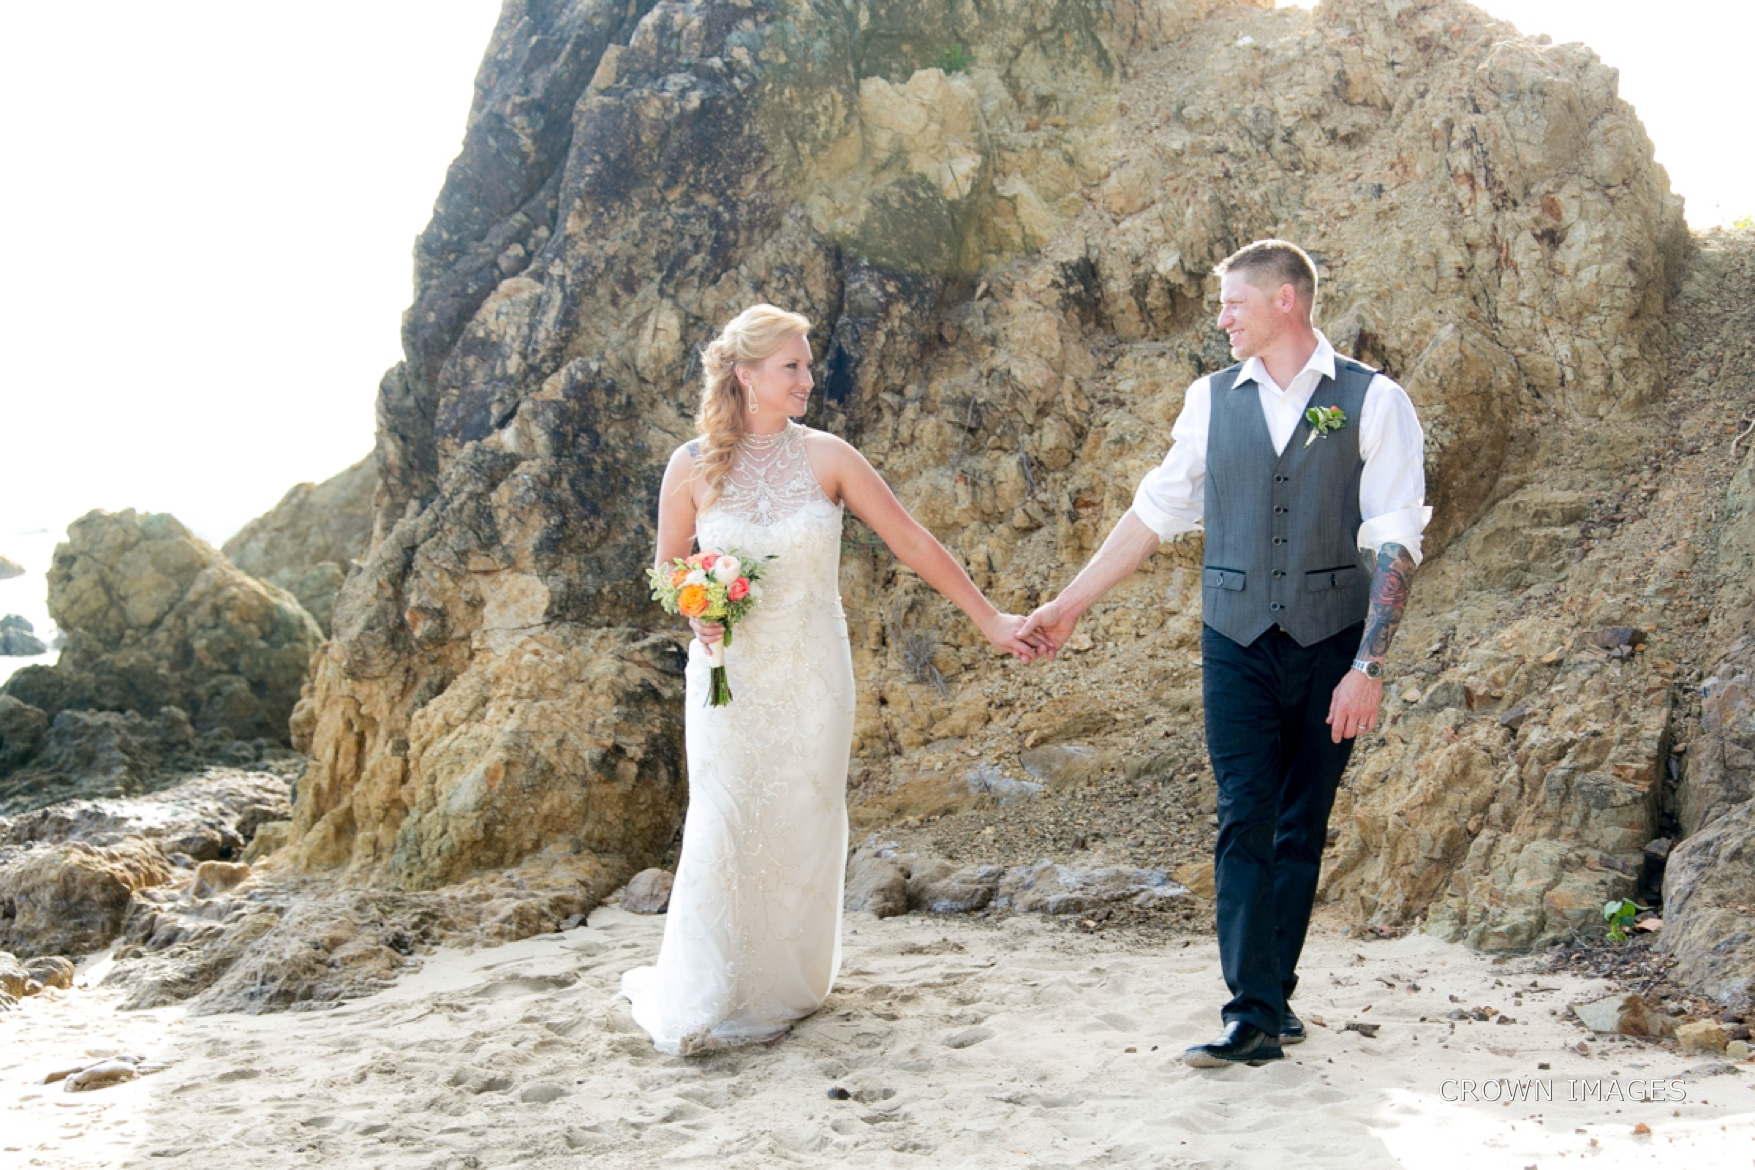 wedding_photos_saint_thomas_crown_images_0597.jpg